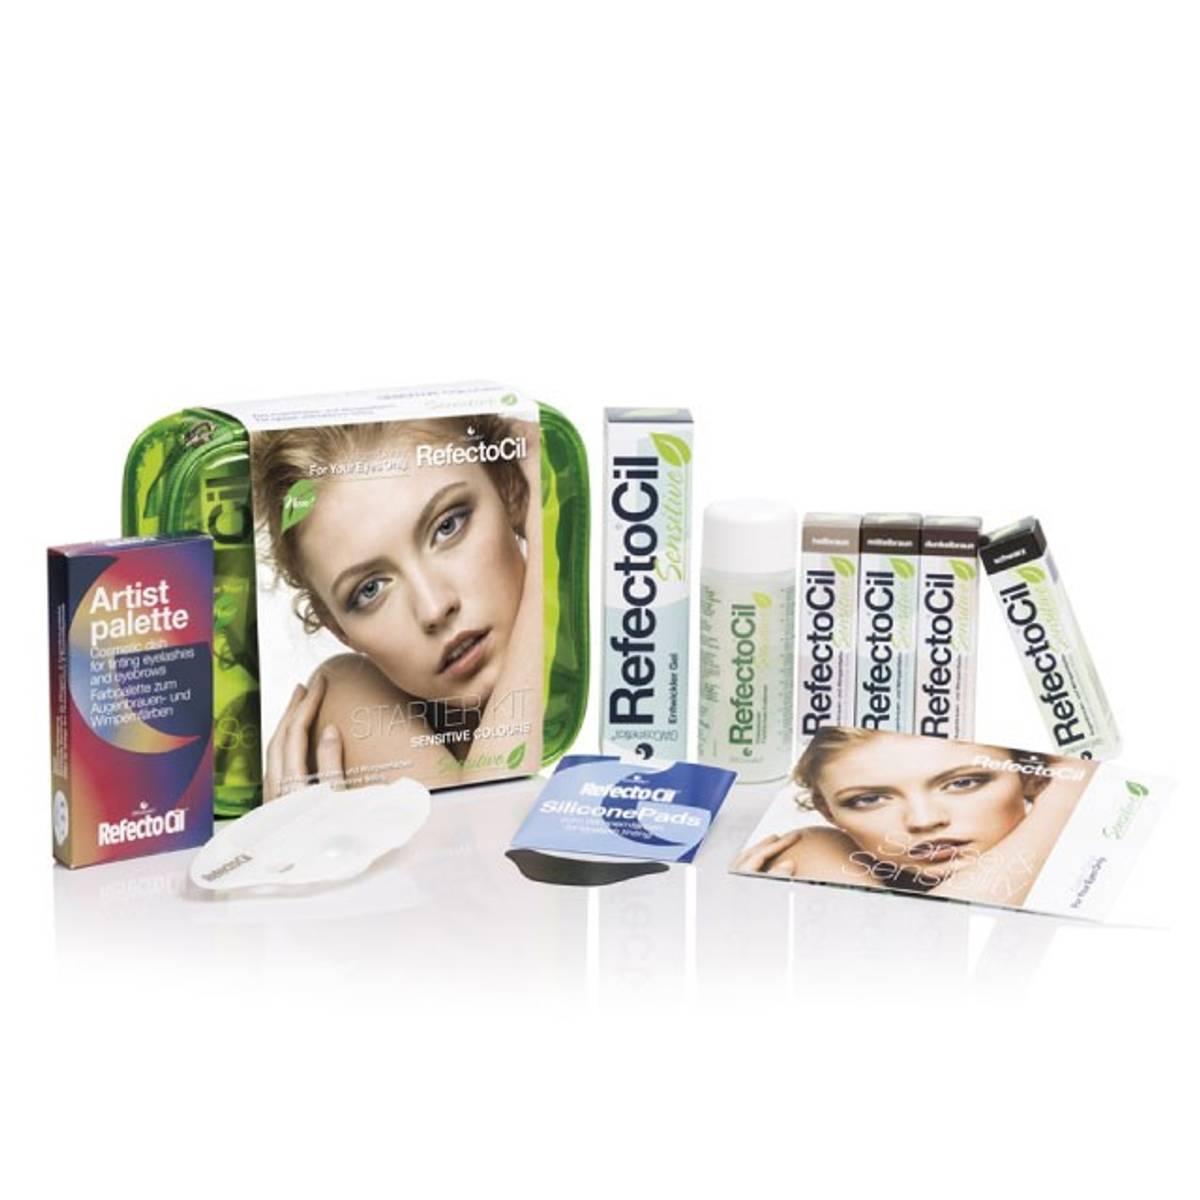 RefectoCil Sensitive Start Kit Basic